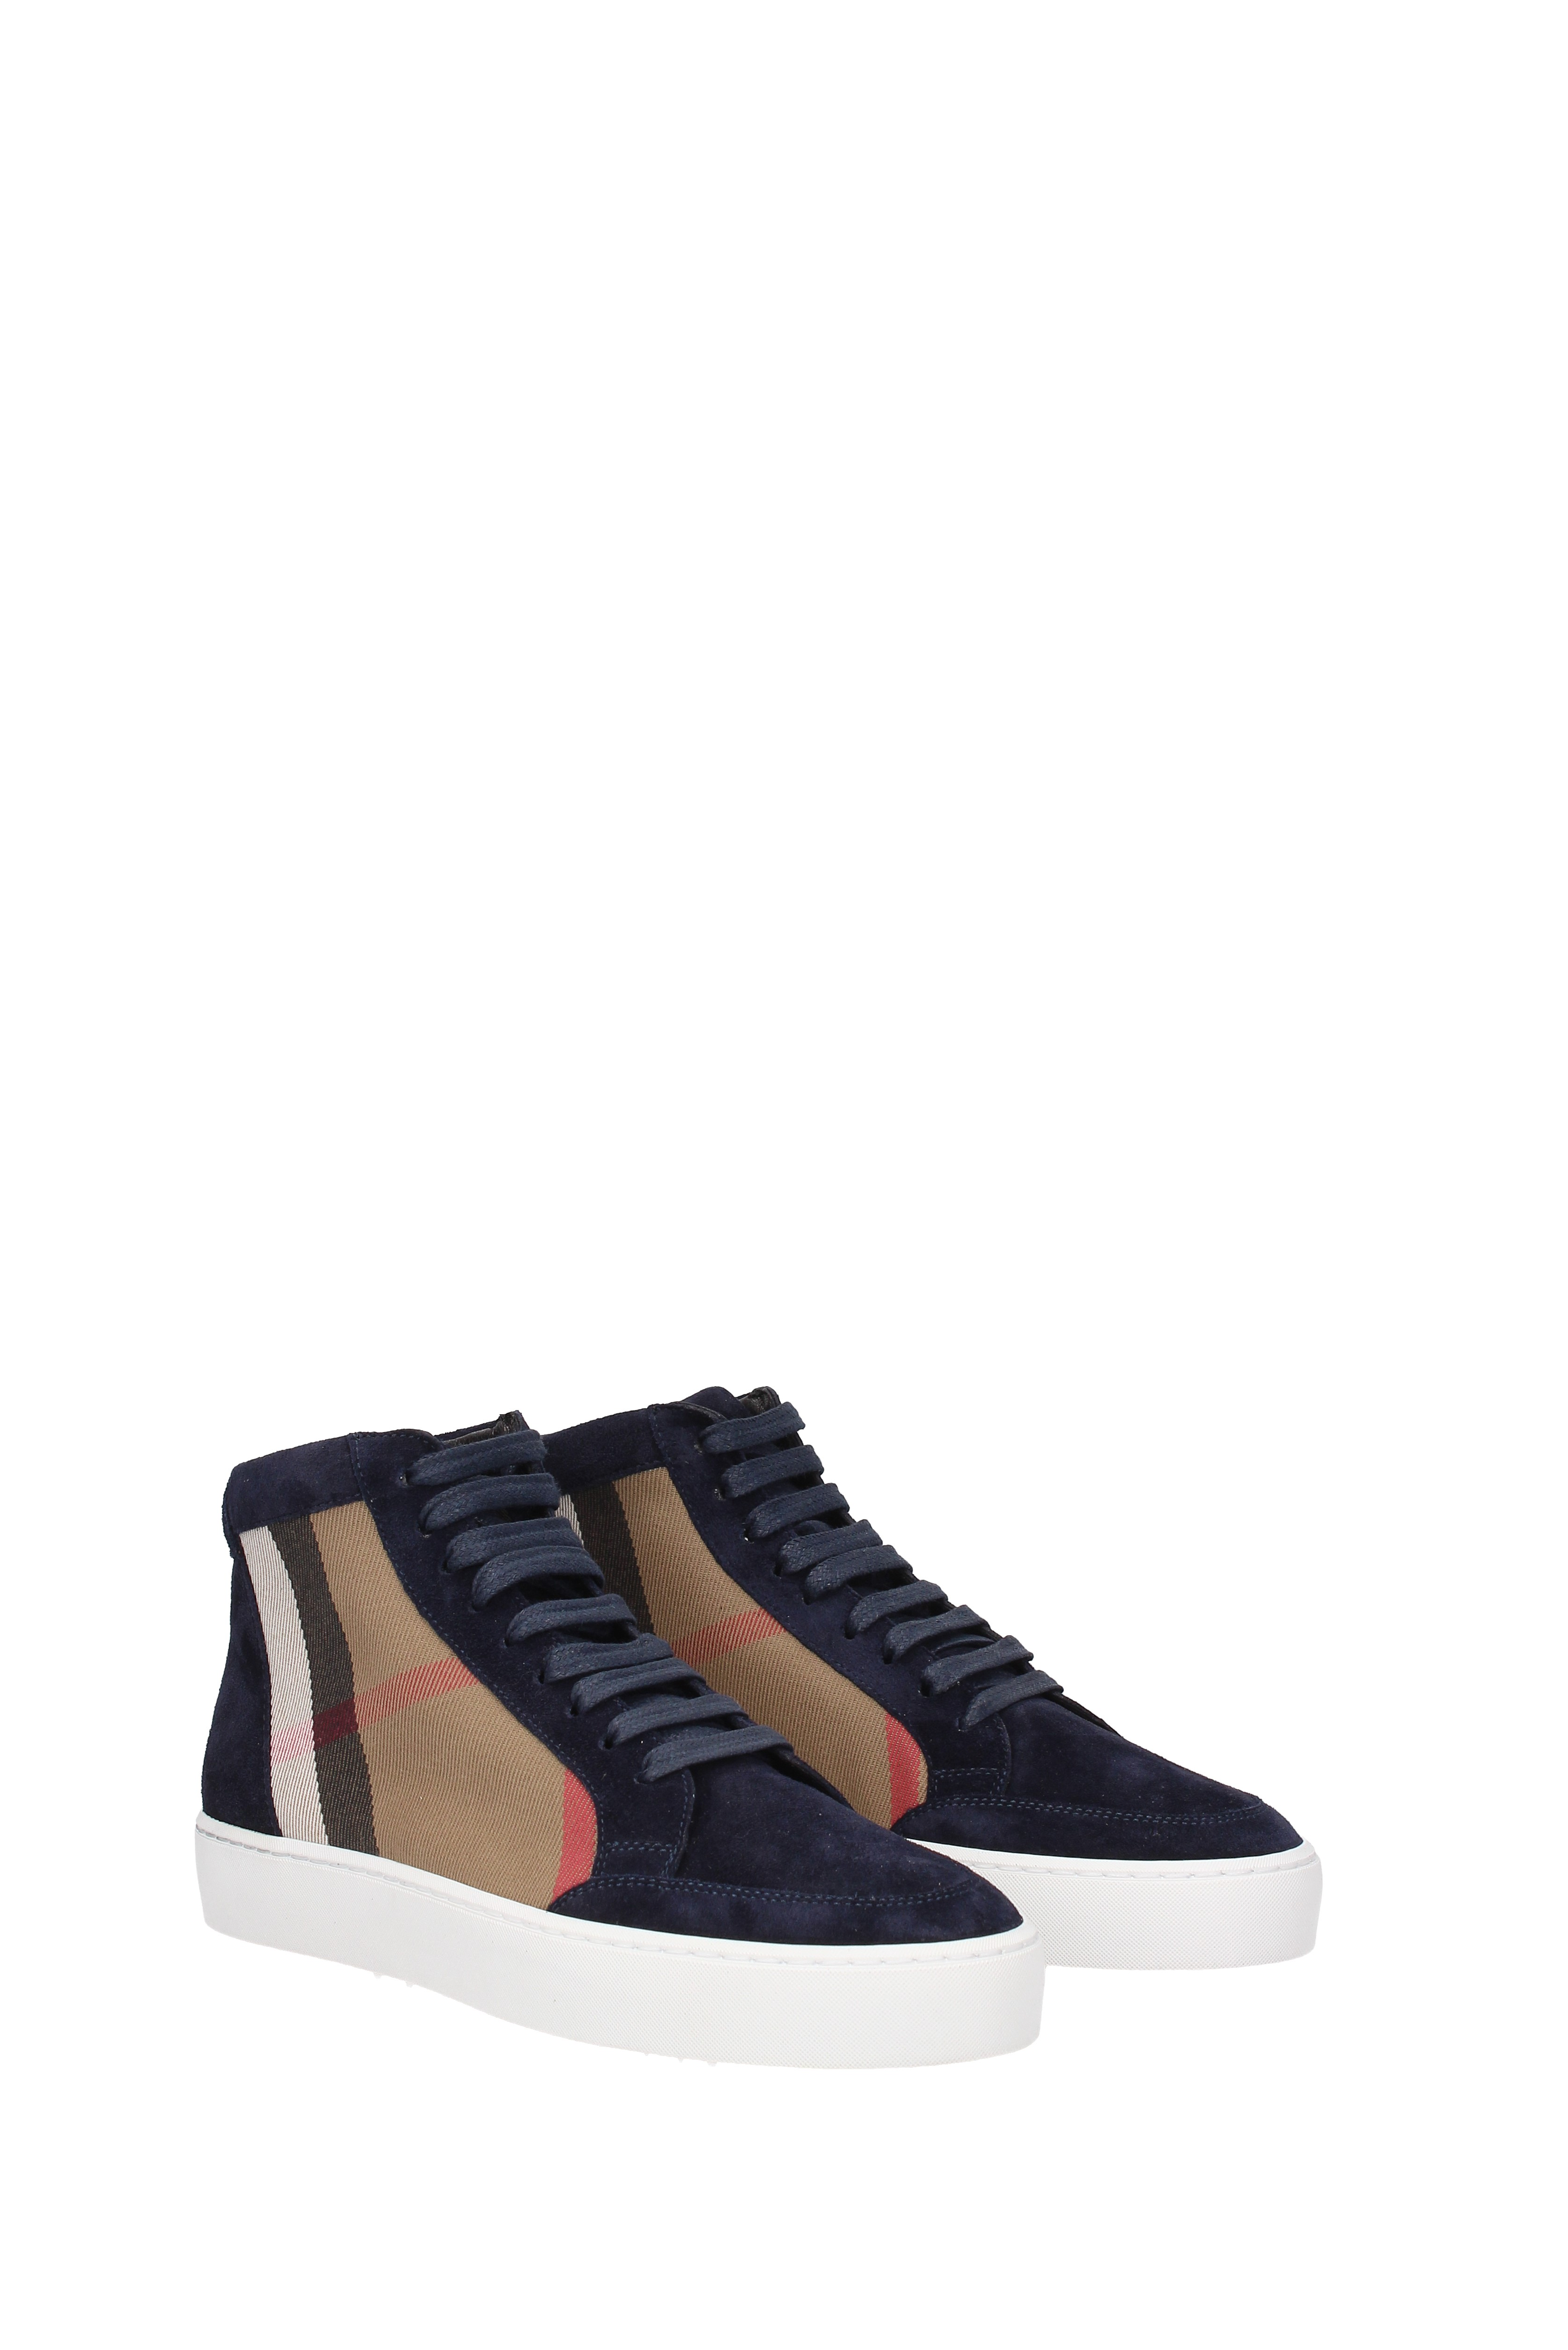 Sneakers Sneakers Sneakers Burberry Damen - Wildleder (402491) 84e16f